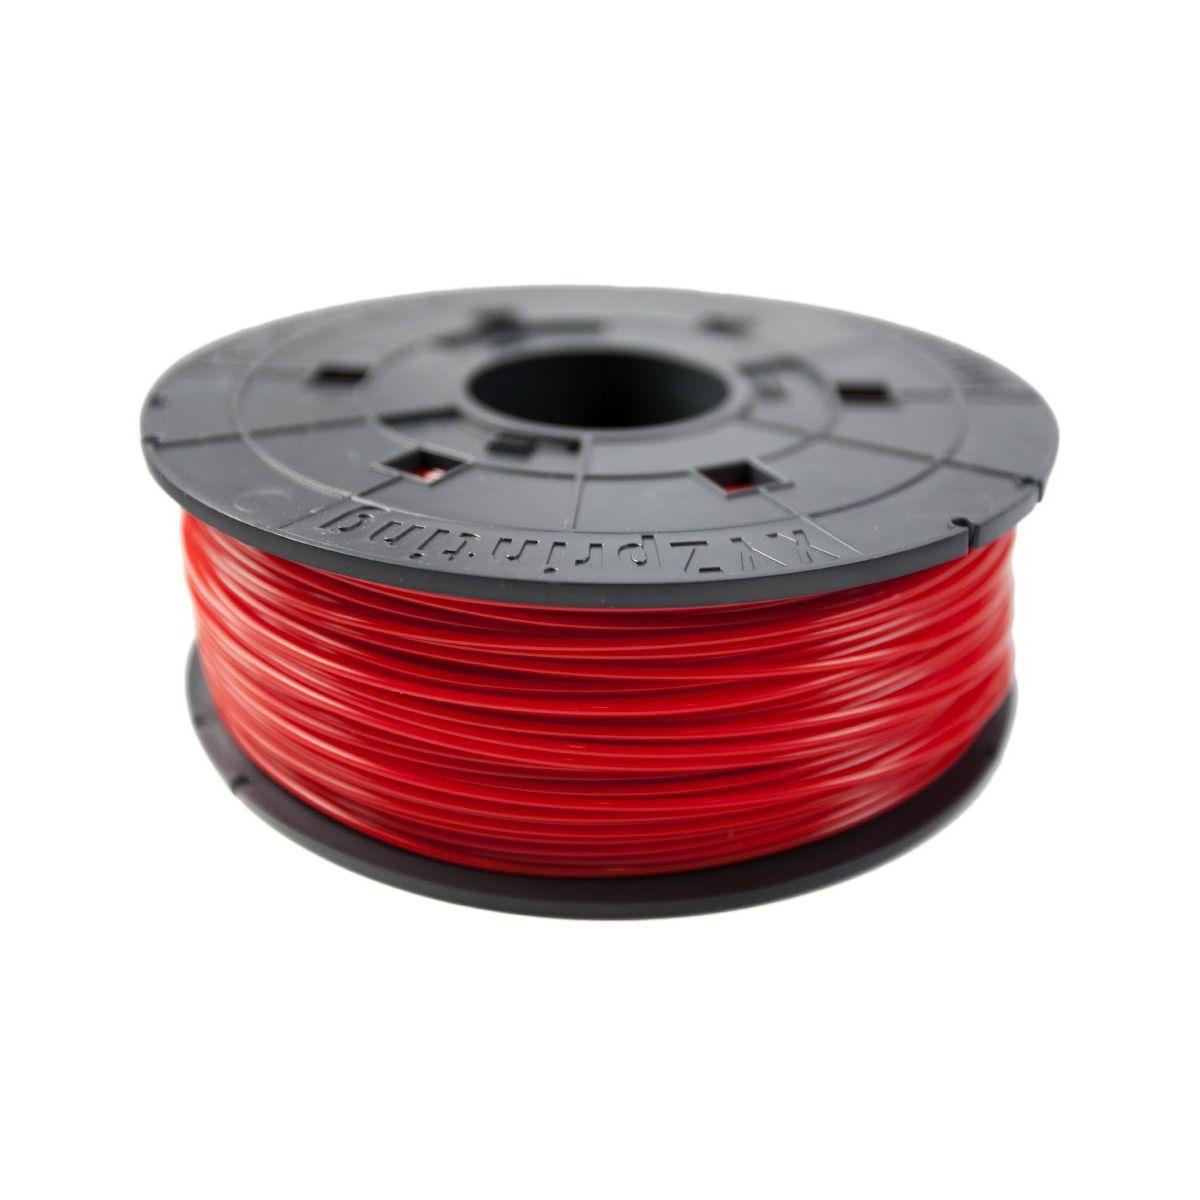 Filament 3D XYZ PRINTING Filament ABS Rouge